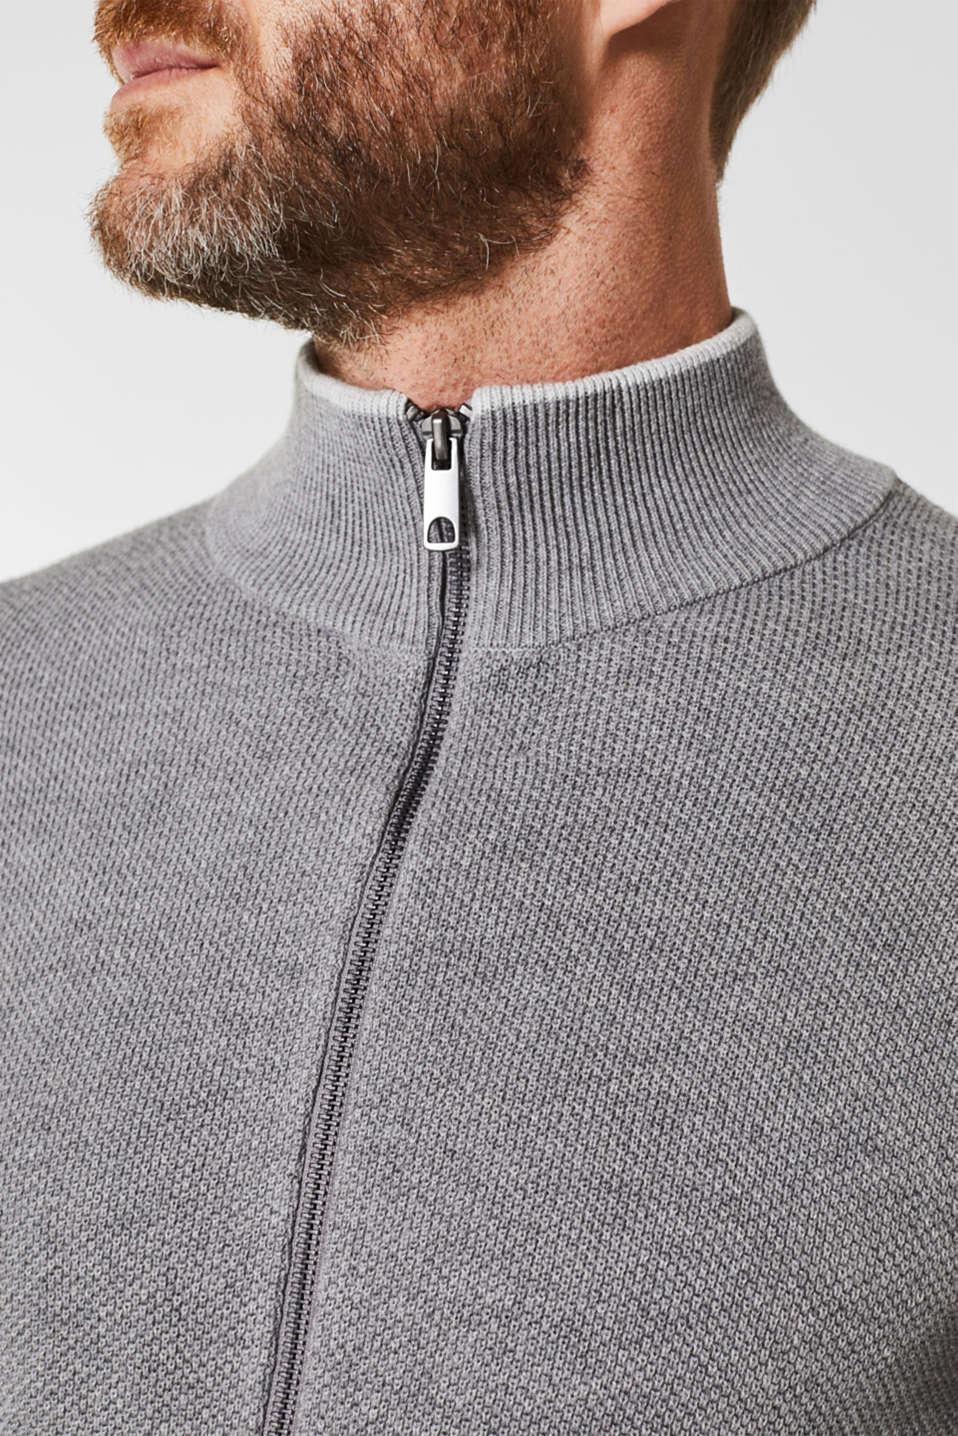 Textured cardigan in 100% cotton, MEDIUM GREY 5, detail image number 2